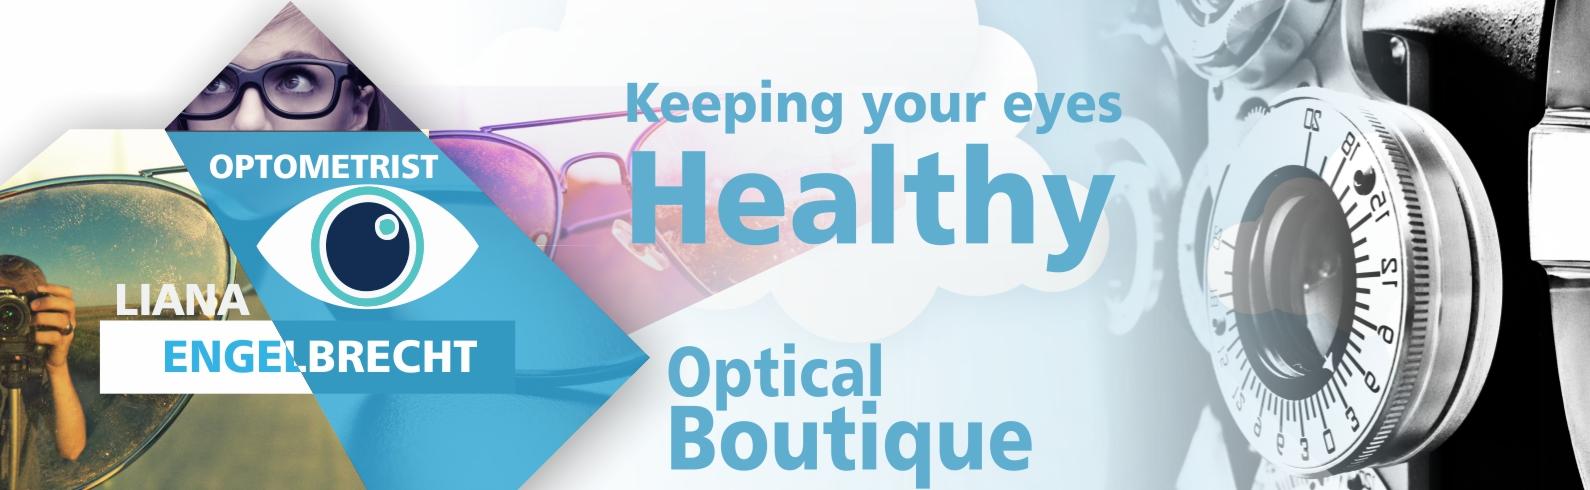 Liana Engelbrecht Optometrist Home Page Banner